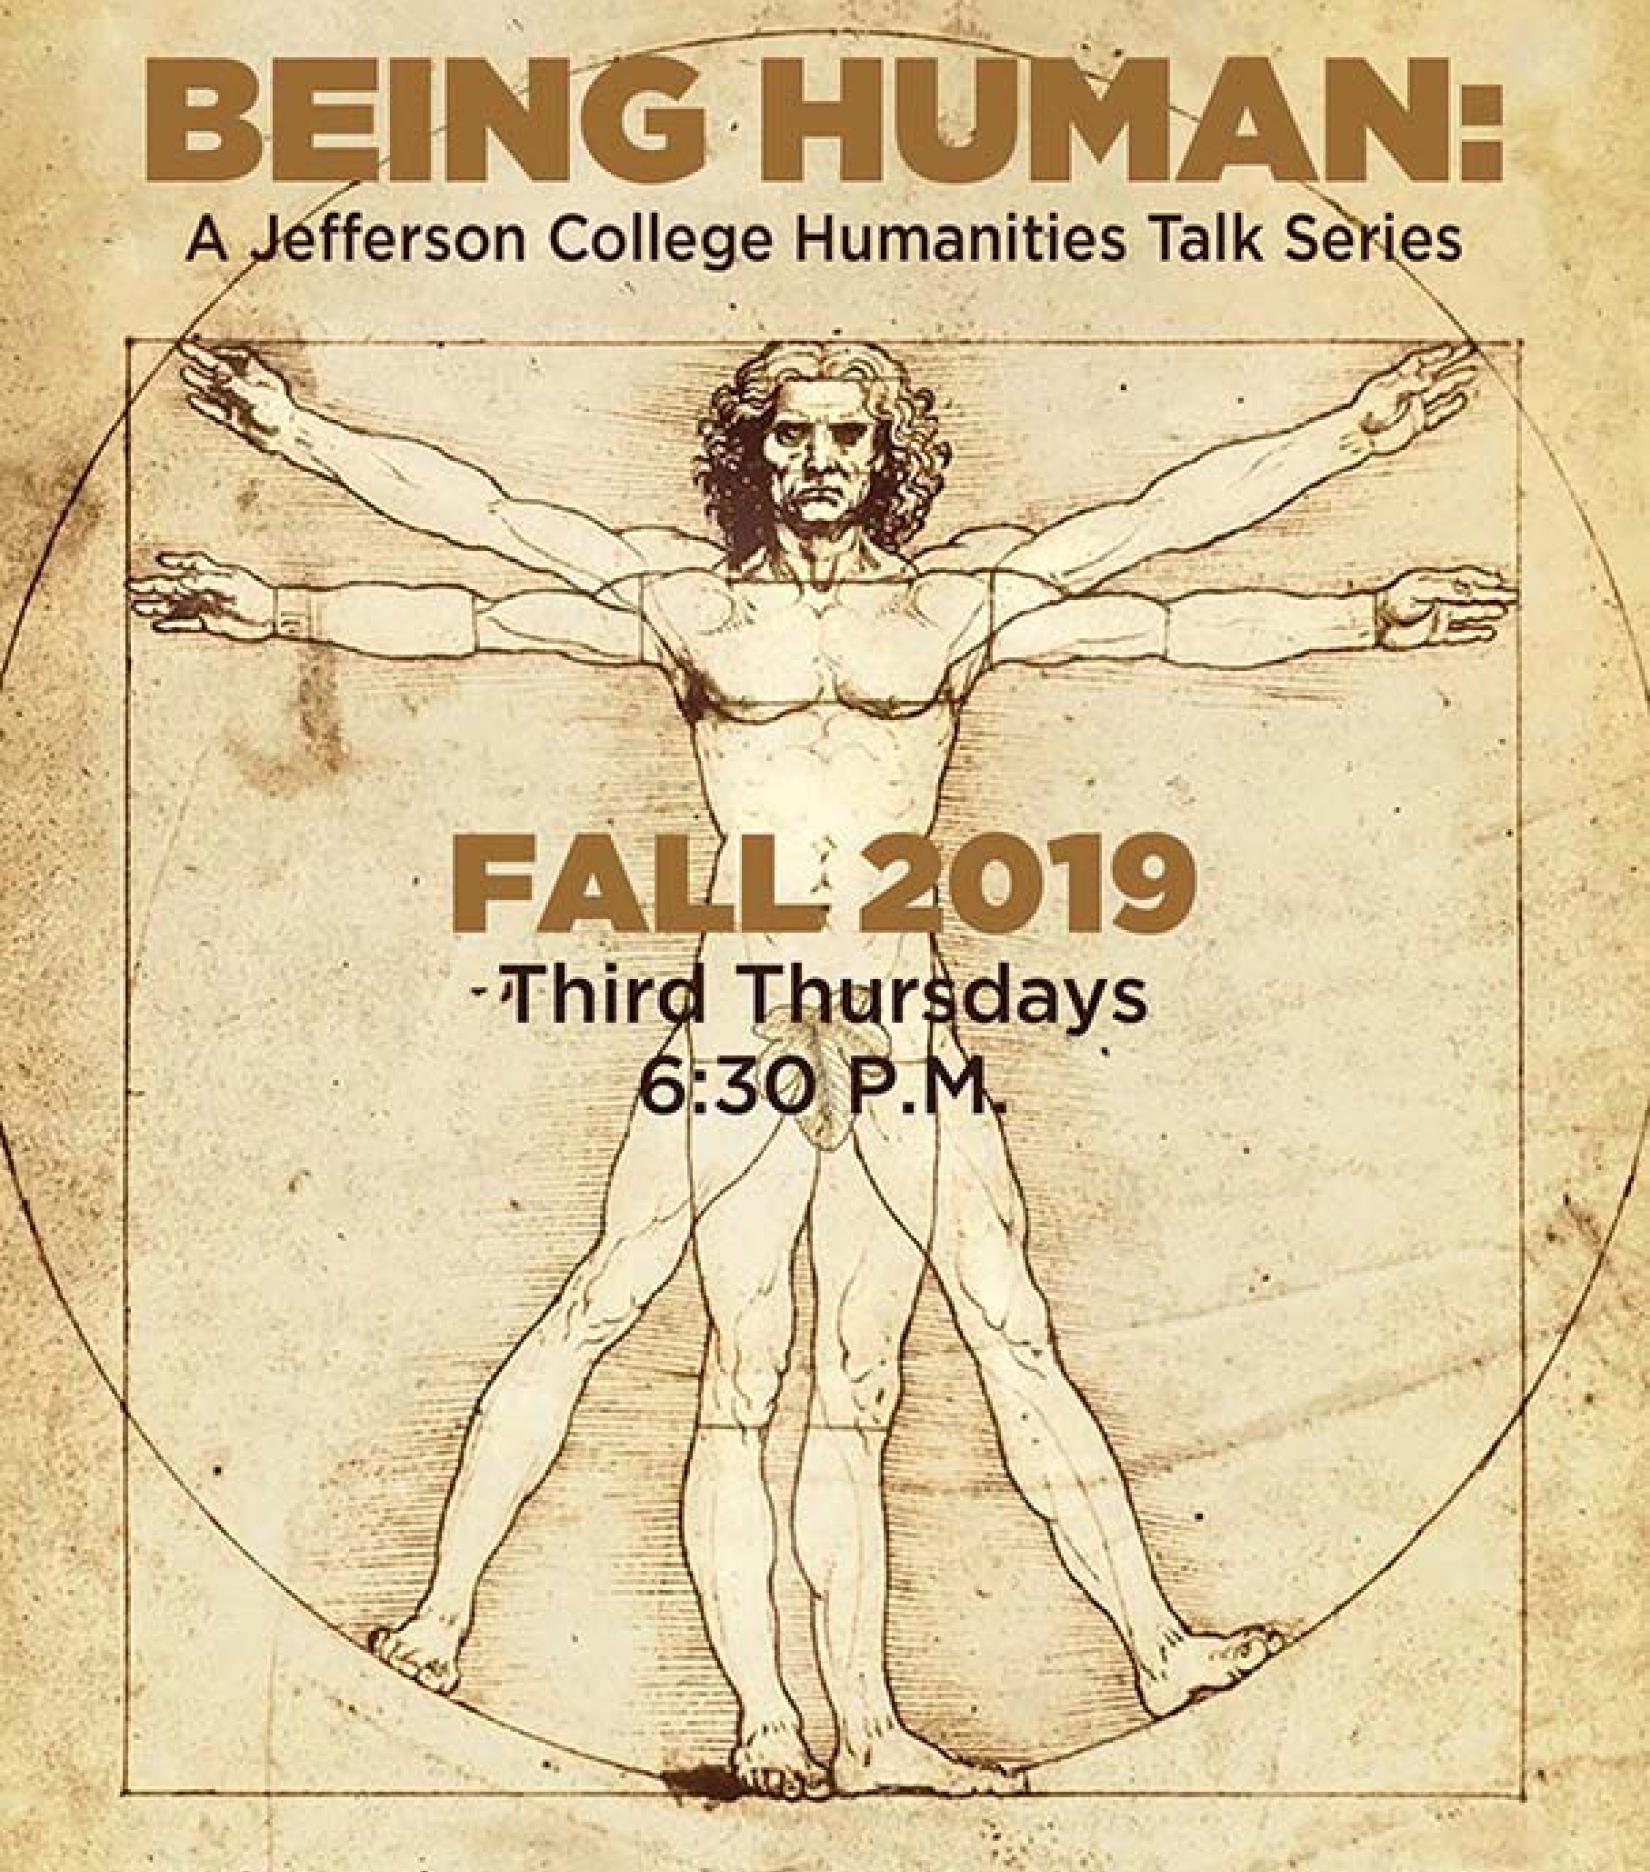 """Being Human"" Humanities Talk Series"